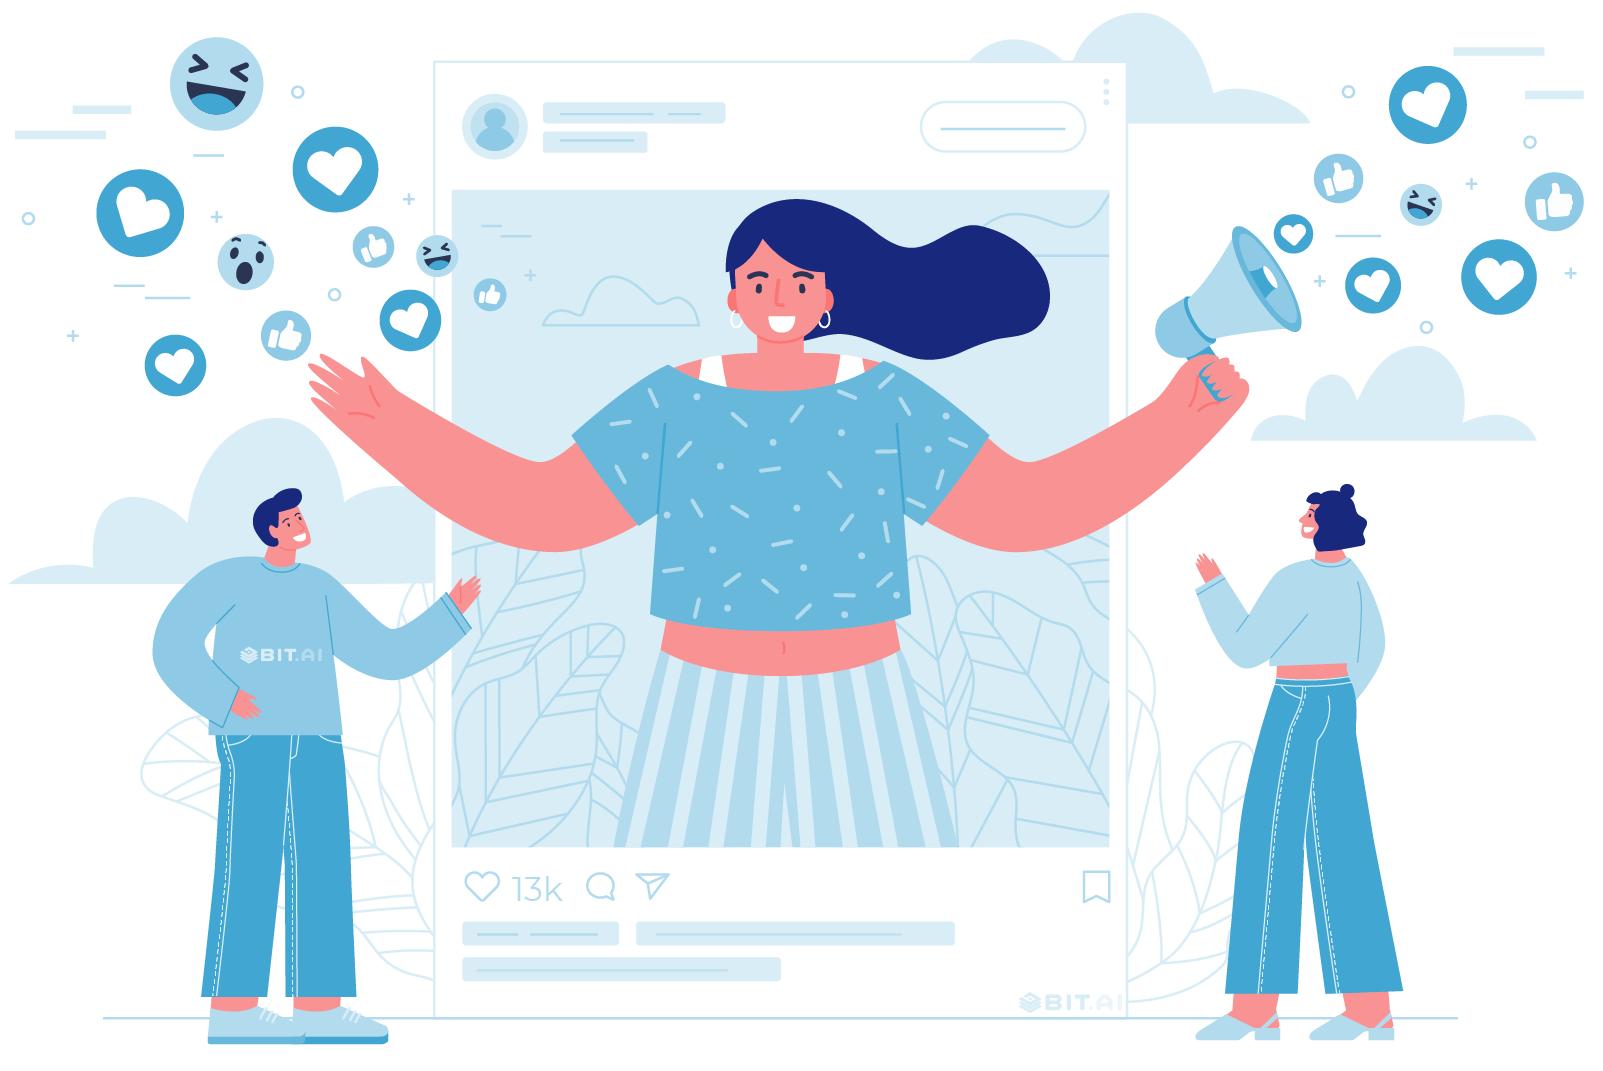 Instagram marketing as an online business idea